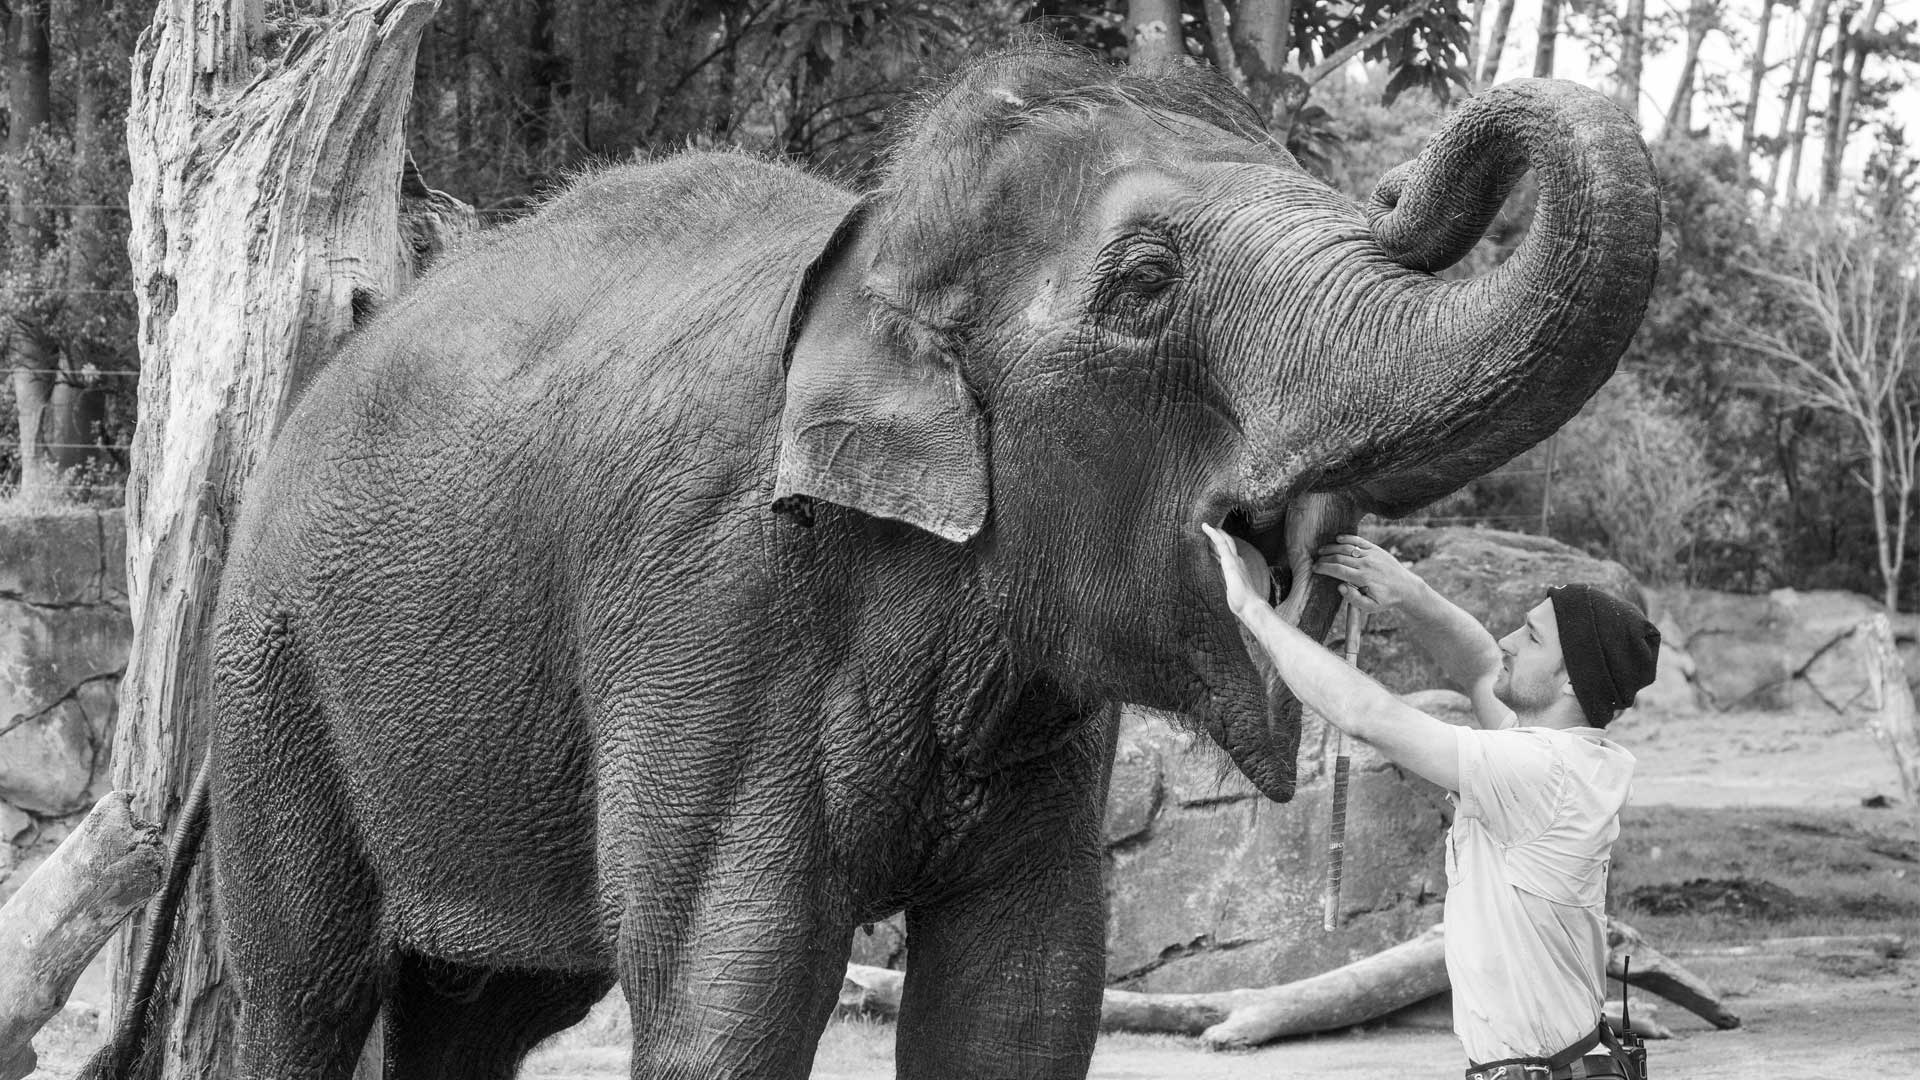 https://rfacdn.nz/zoo/assets/media/world-elephant-day-gallery-4.jpg